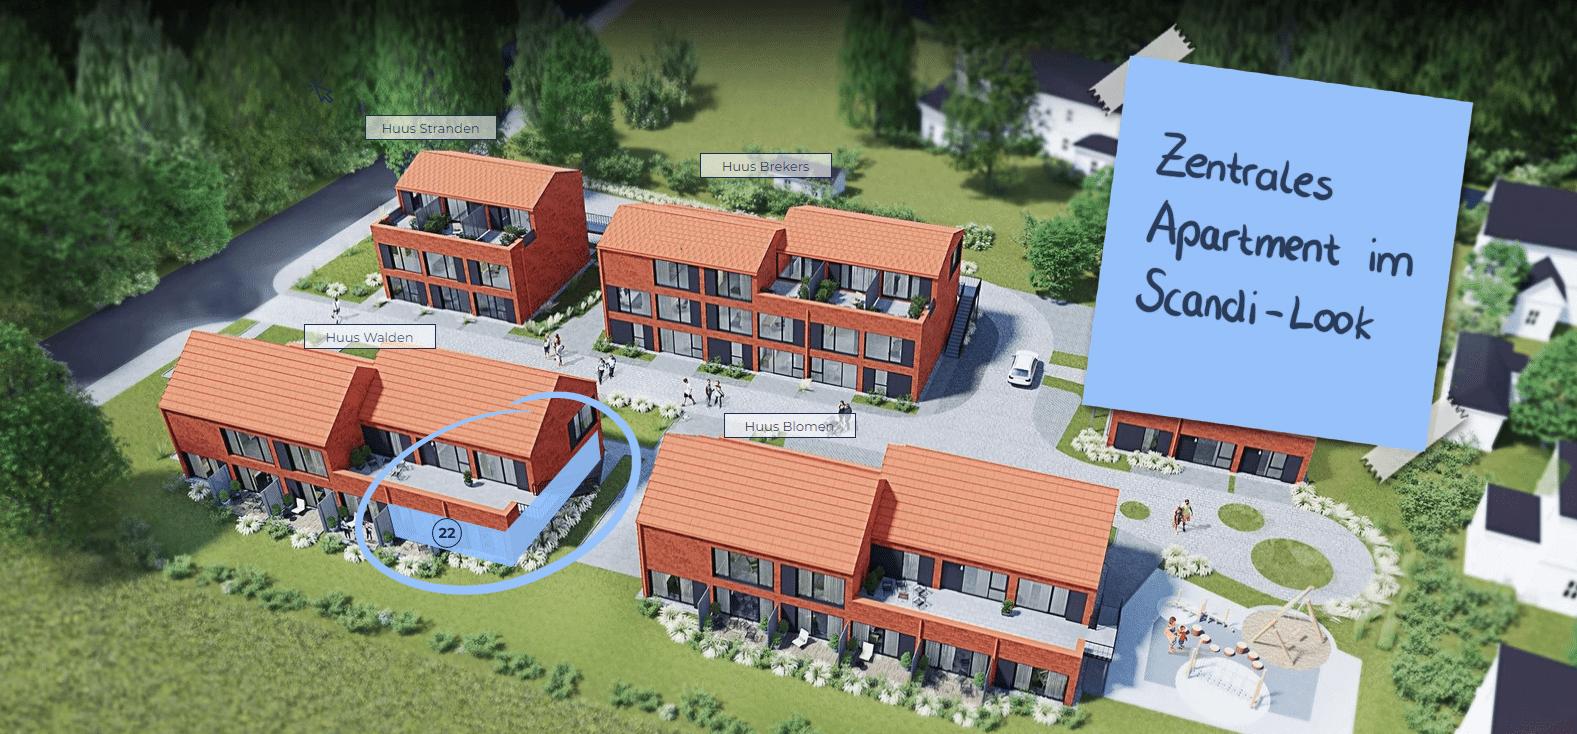 22_De ole School - Ostseeurlaub Ferienapartments Hohwacht Nähe Heiligenhafen Lütjenburg Kieler Bucht